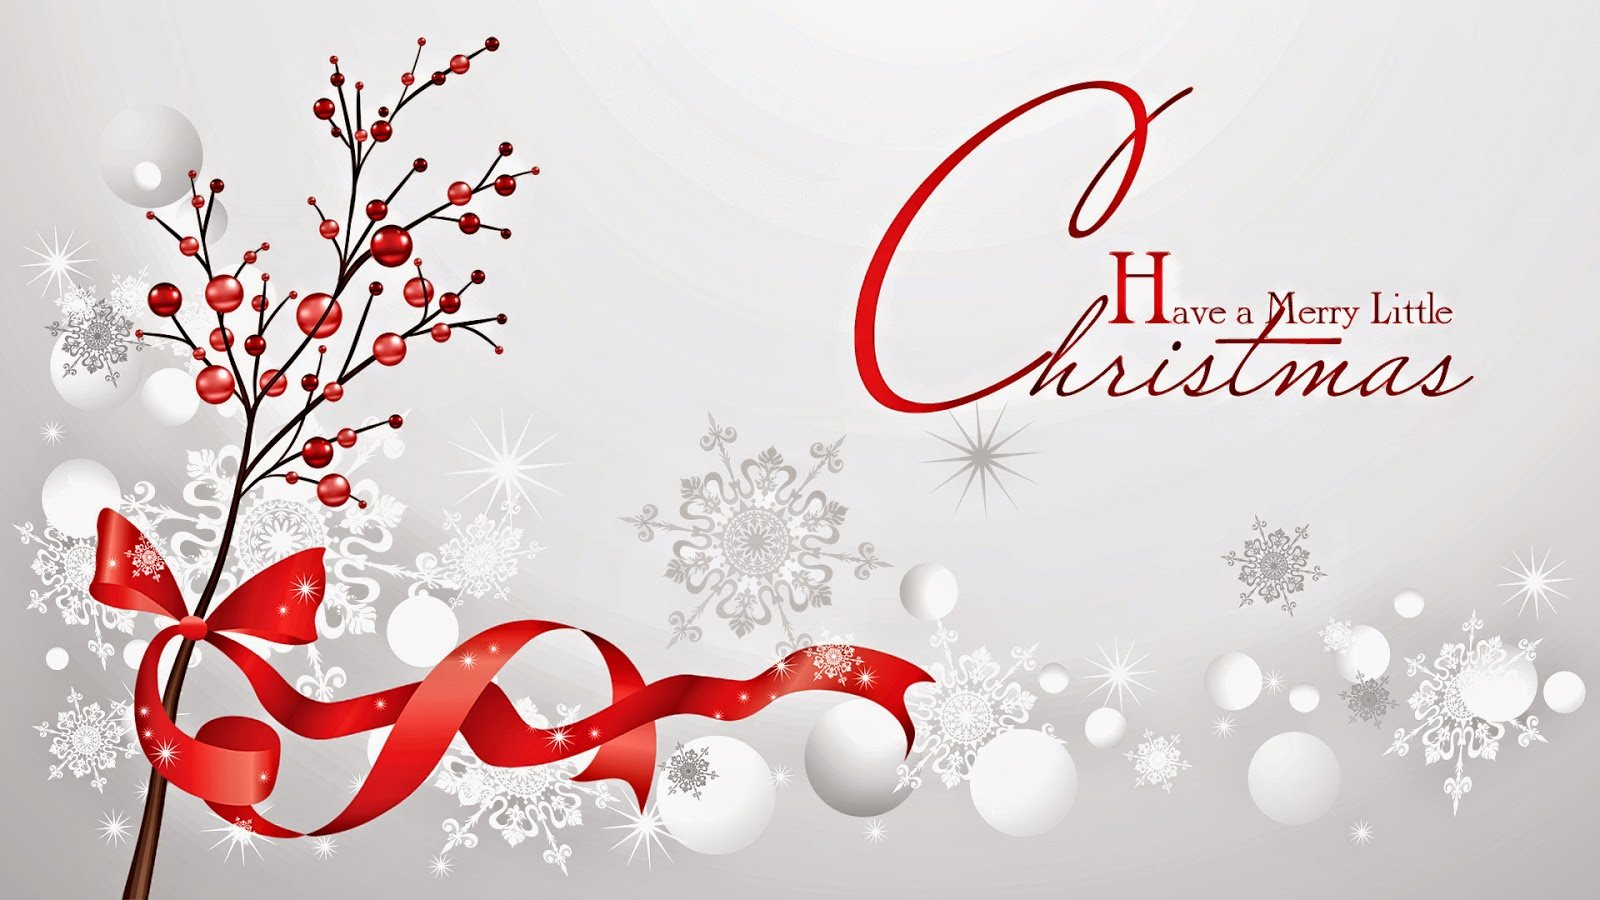 Inspirational Christmas Images